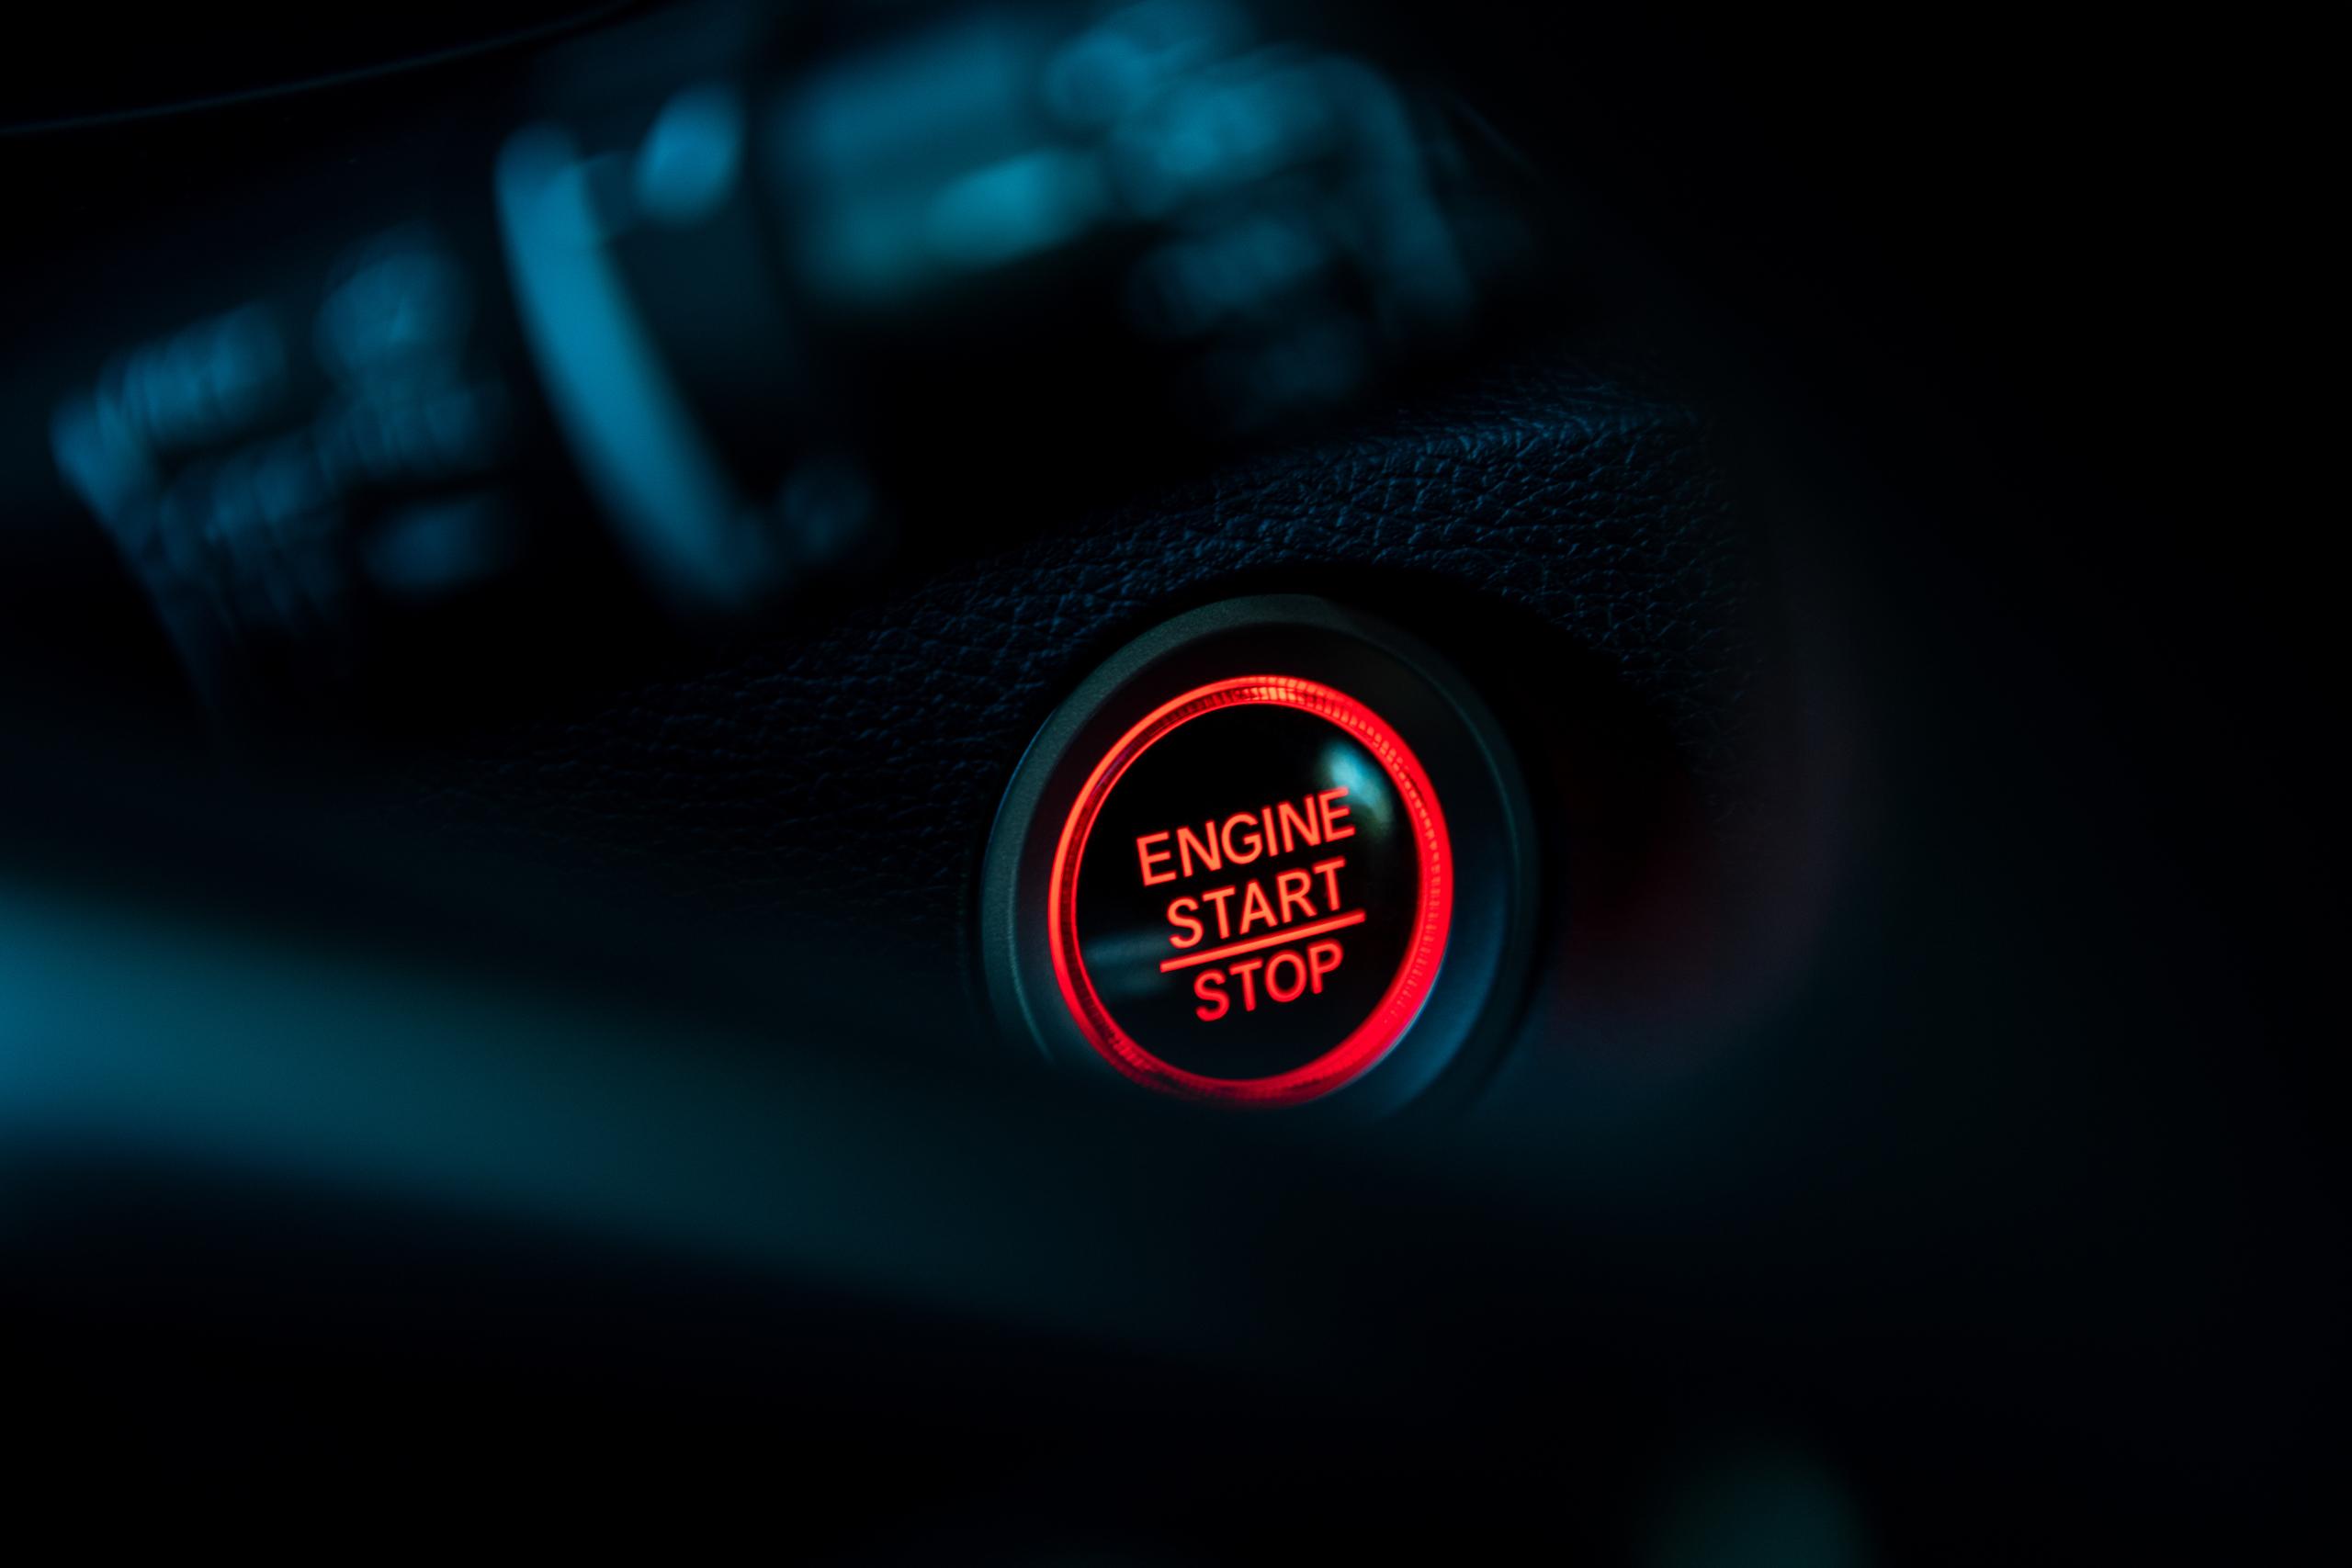 2020 Honda Civic Type R interior start stop button detail